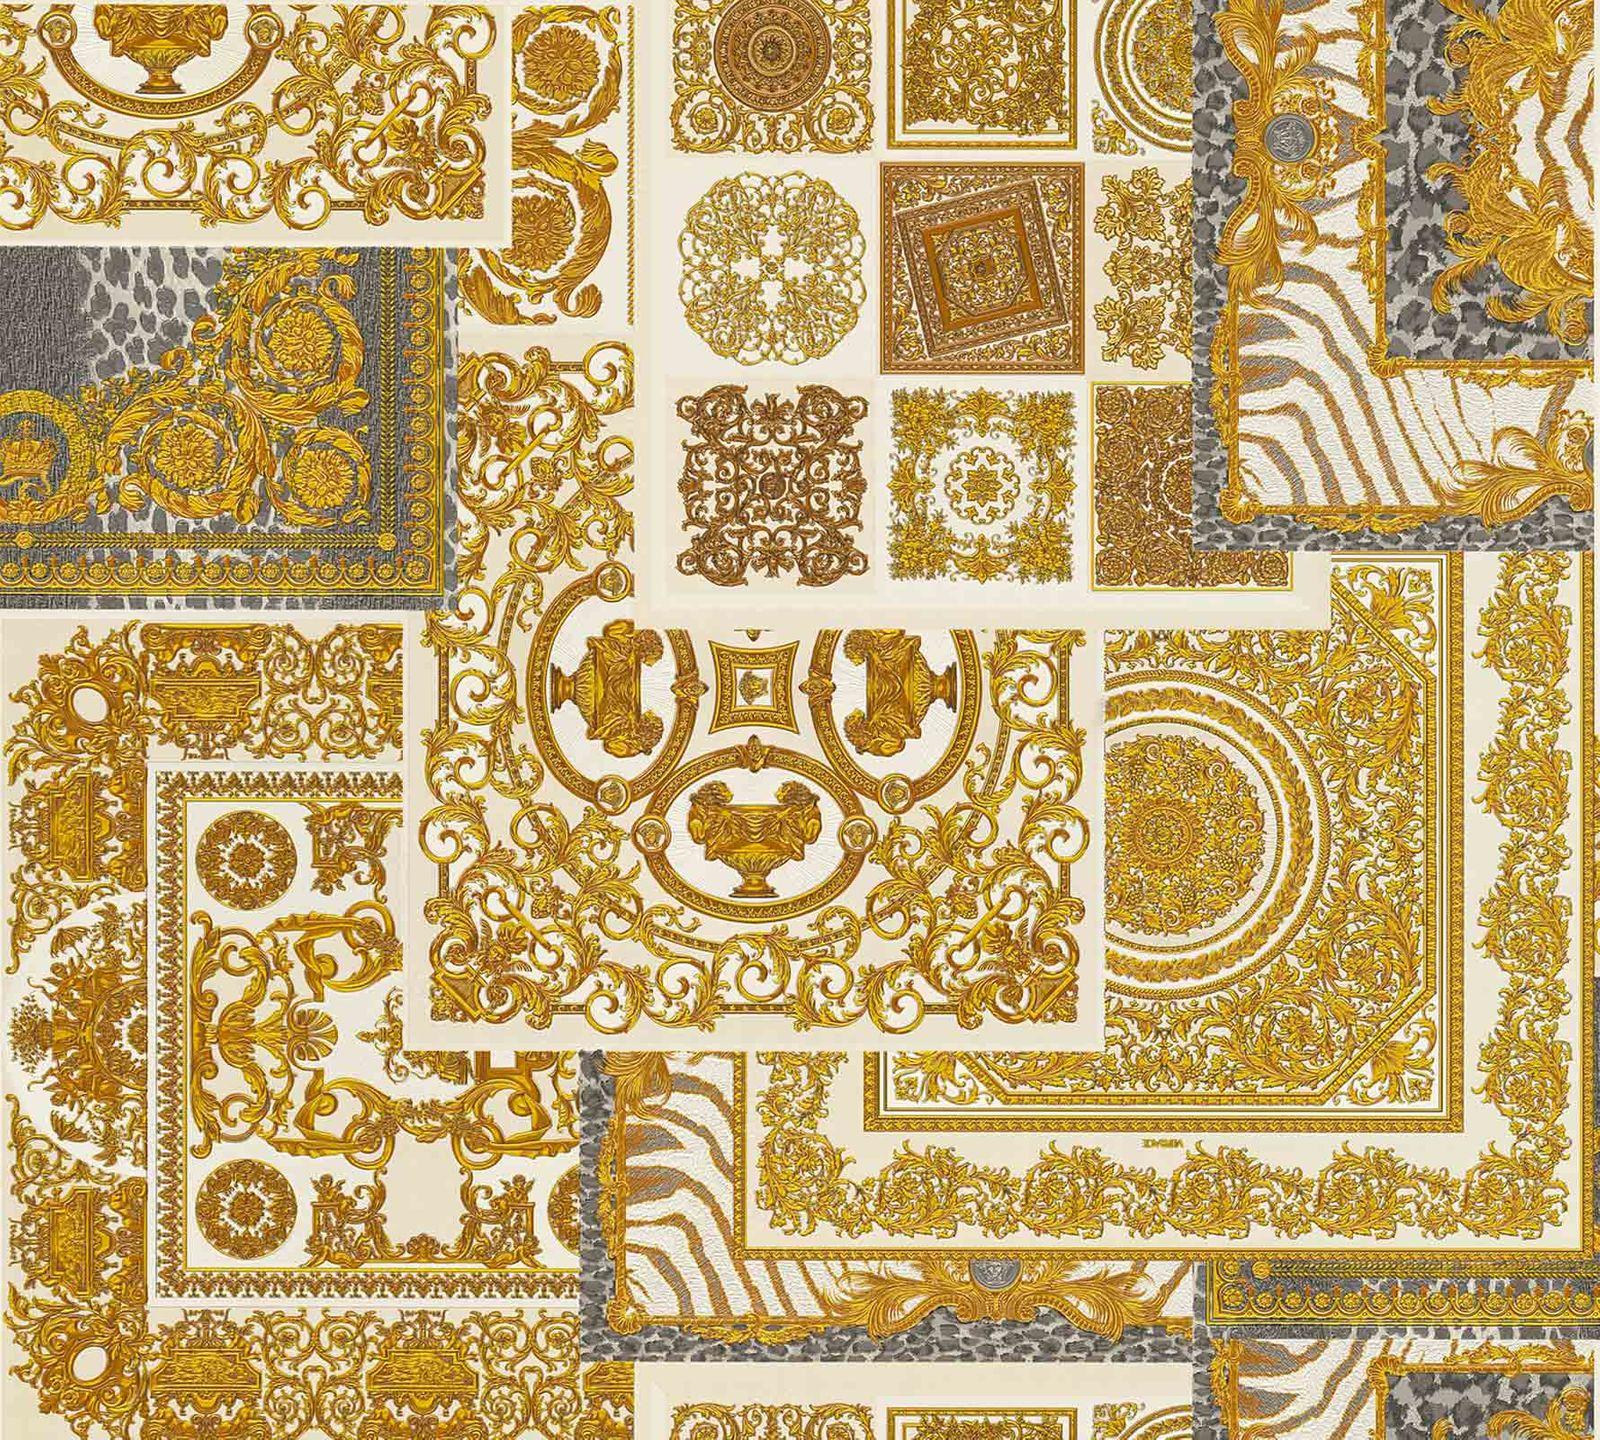 tapete versace home kacheln wei gold metallic 370484. Black Bedroom Furniture Sets. Home Design Ideas